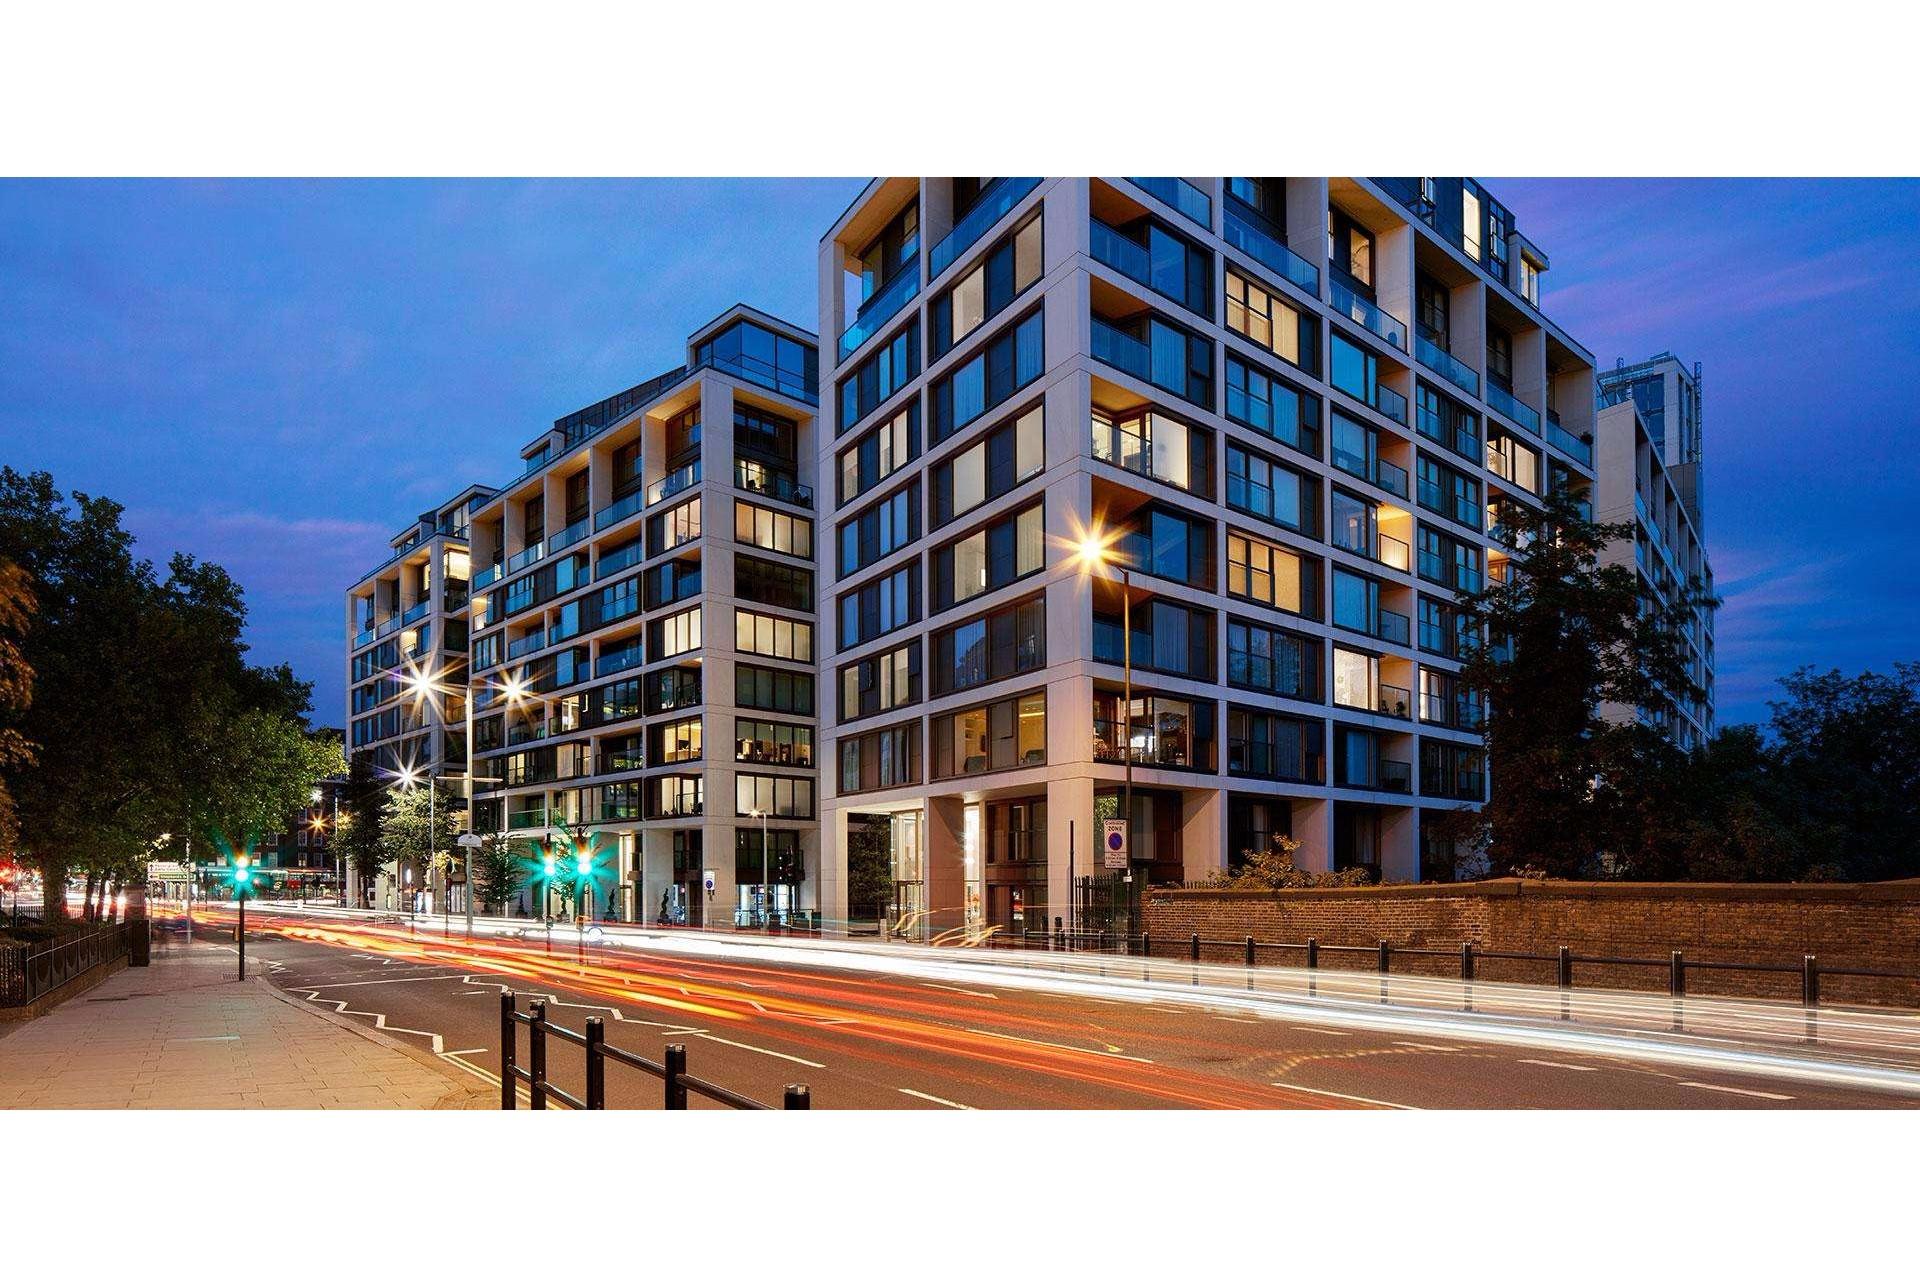 Benson House 4 Radnor Terrace Kensington London W14